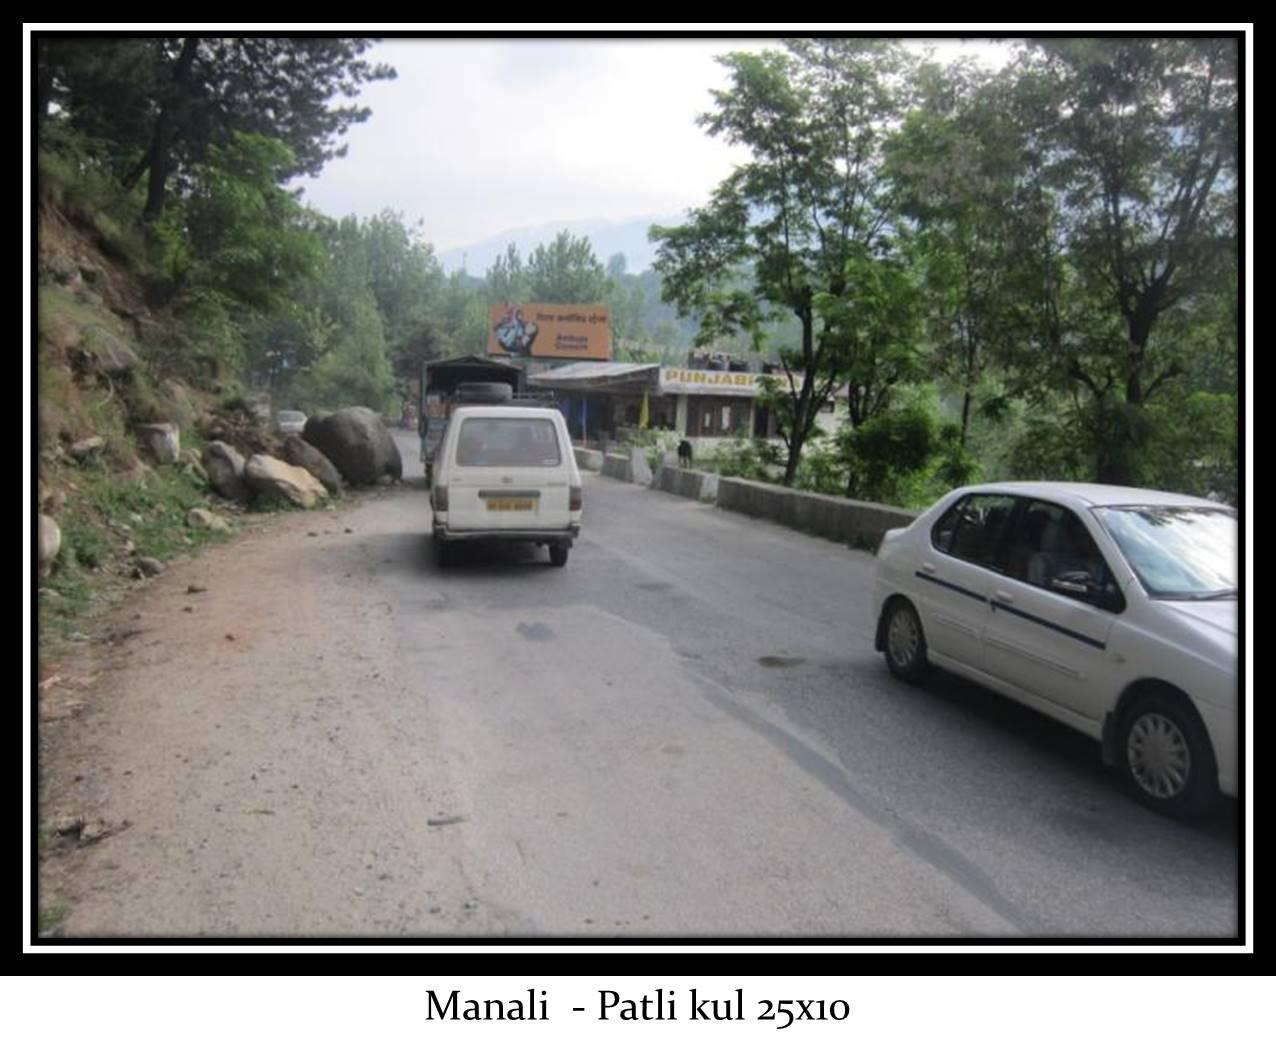 Patlikul, Manali